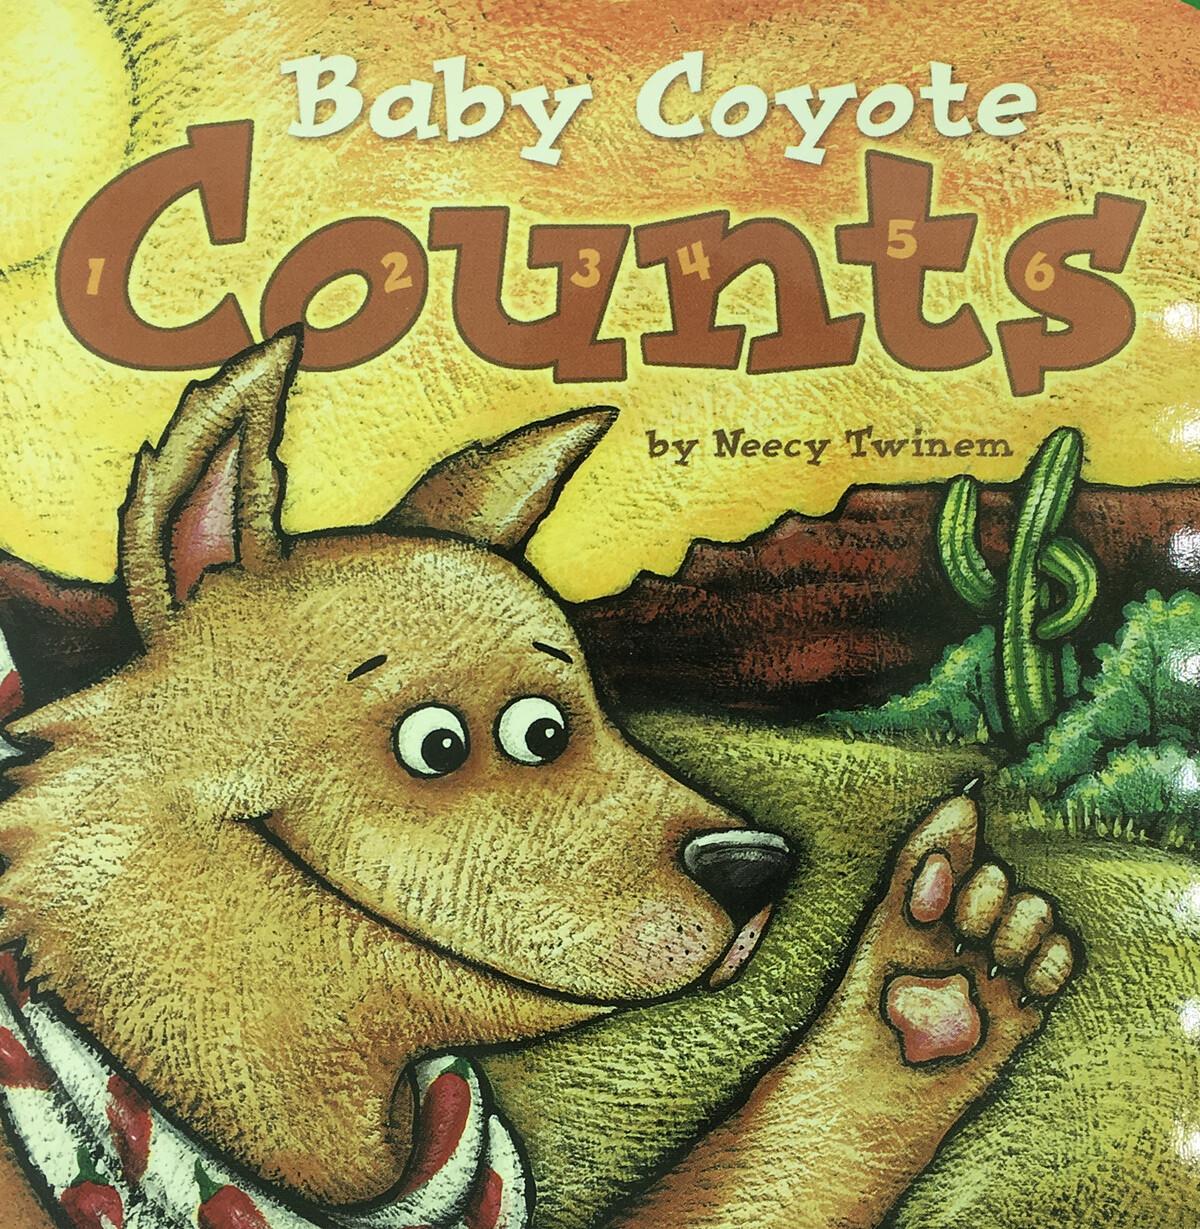 Baby Coyote Counts